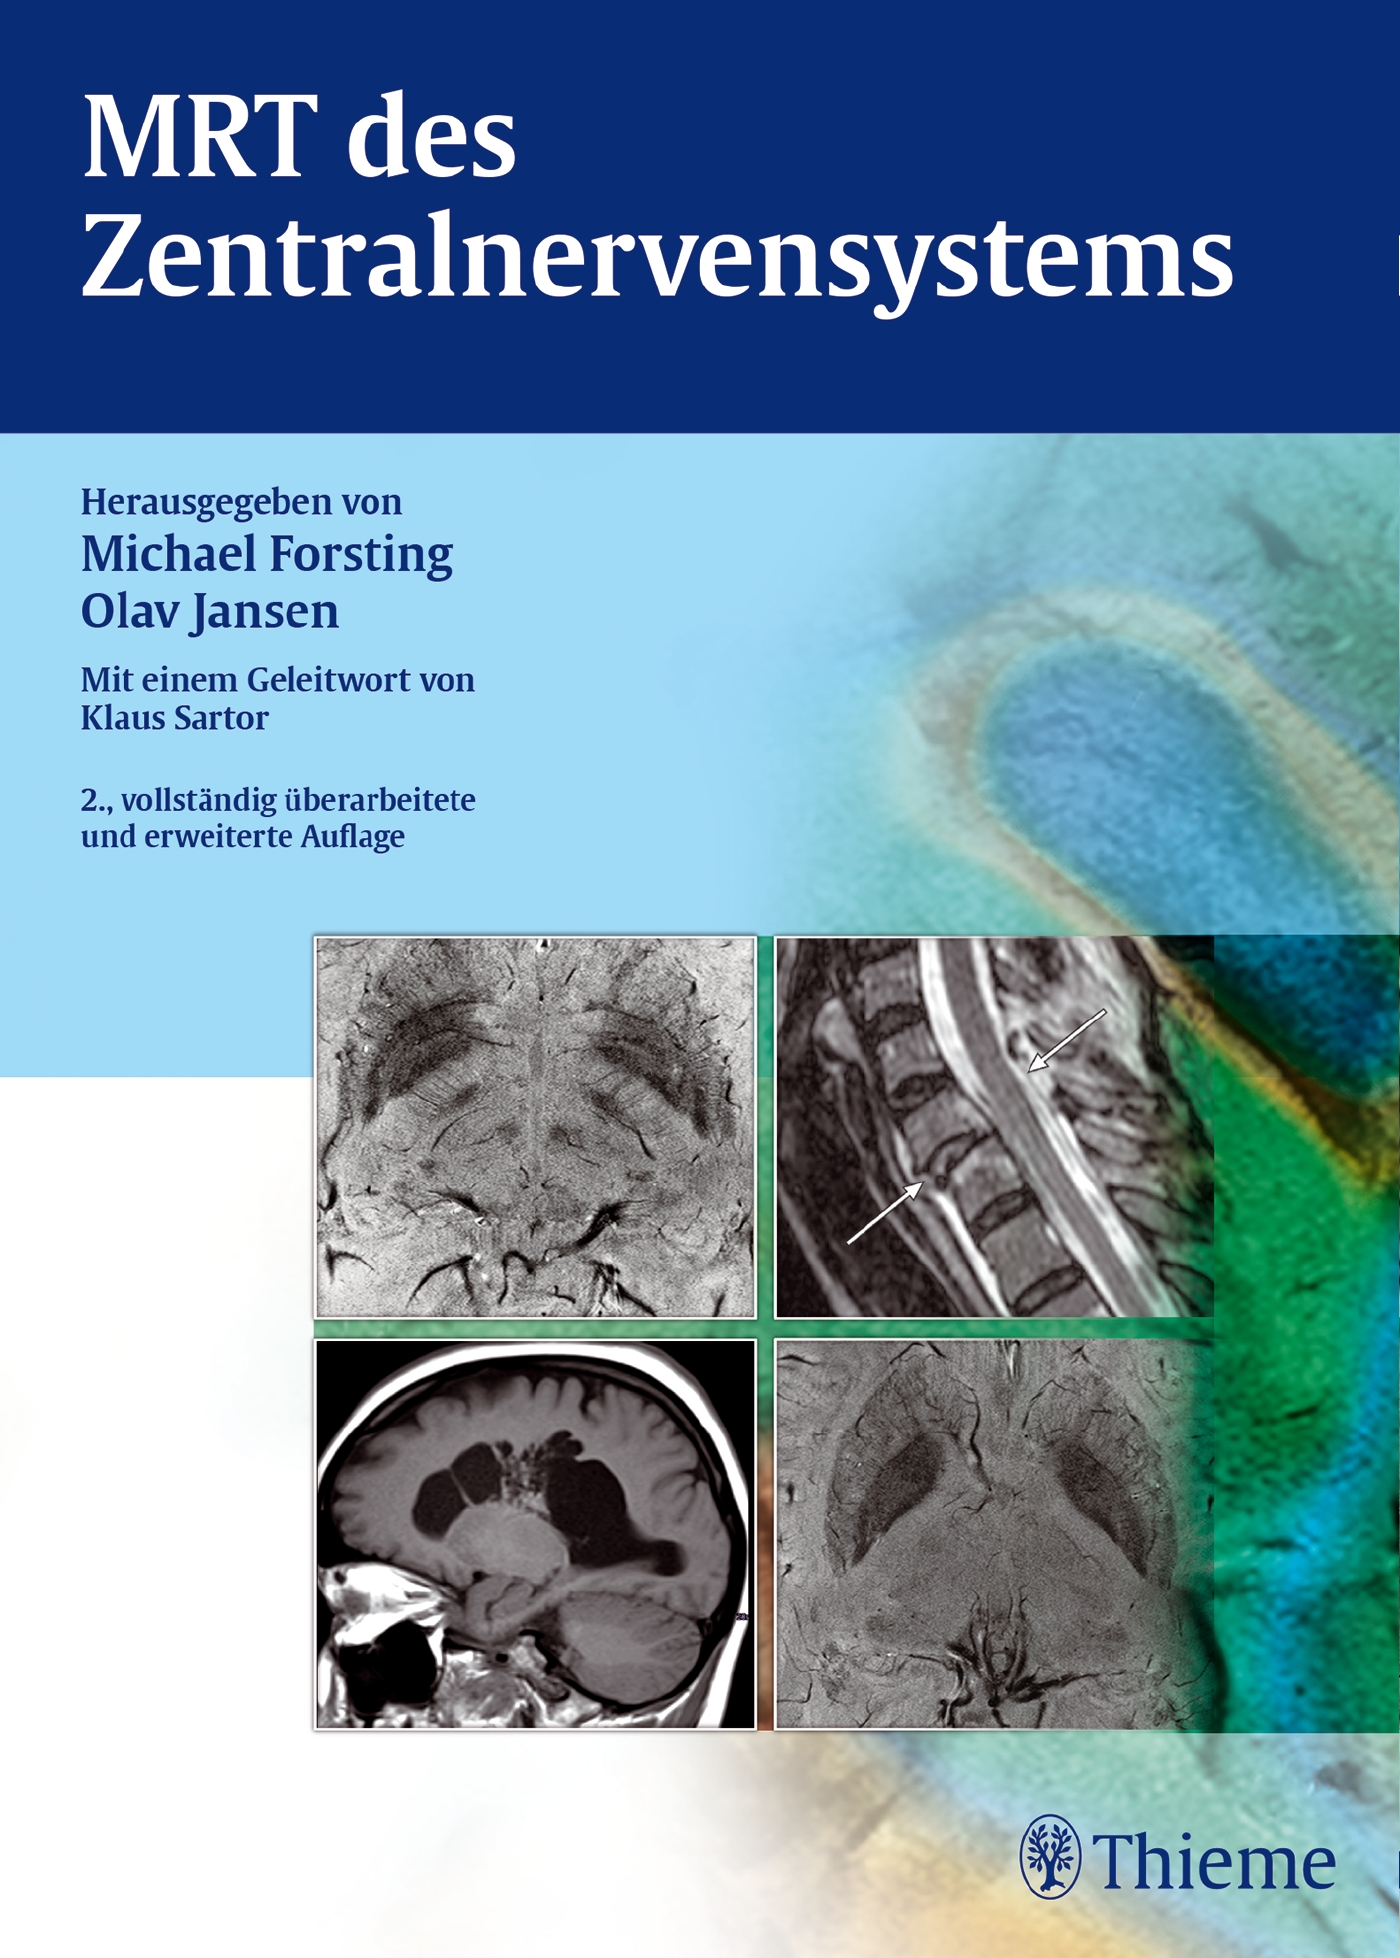 MRT-des-Zentralnervensystems-Michael-Forsting